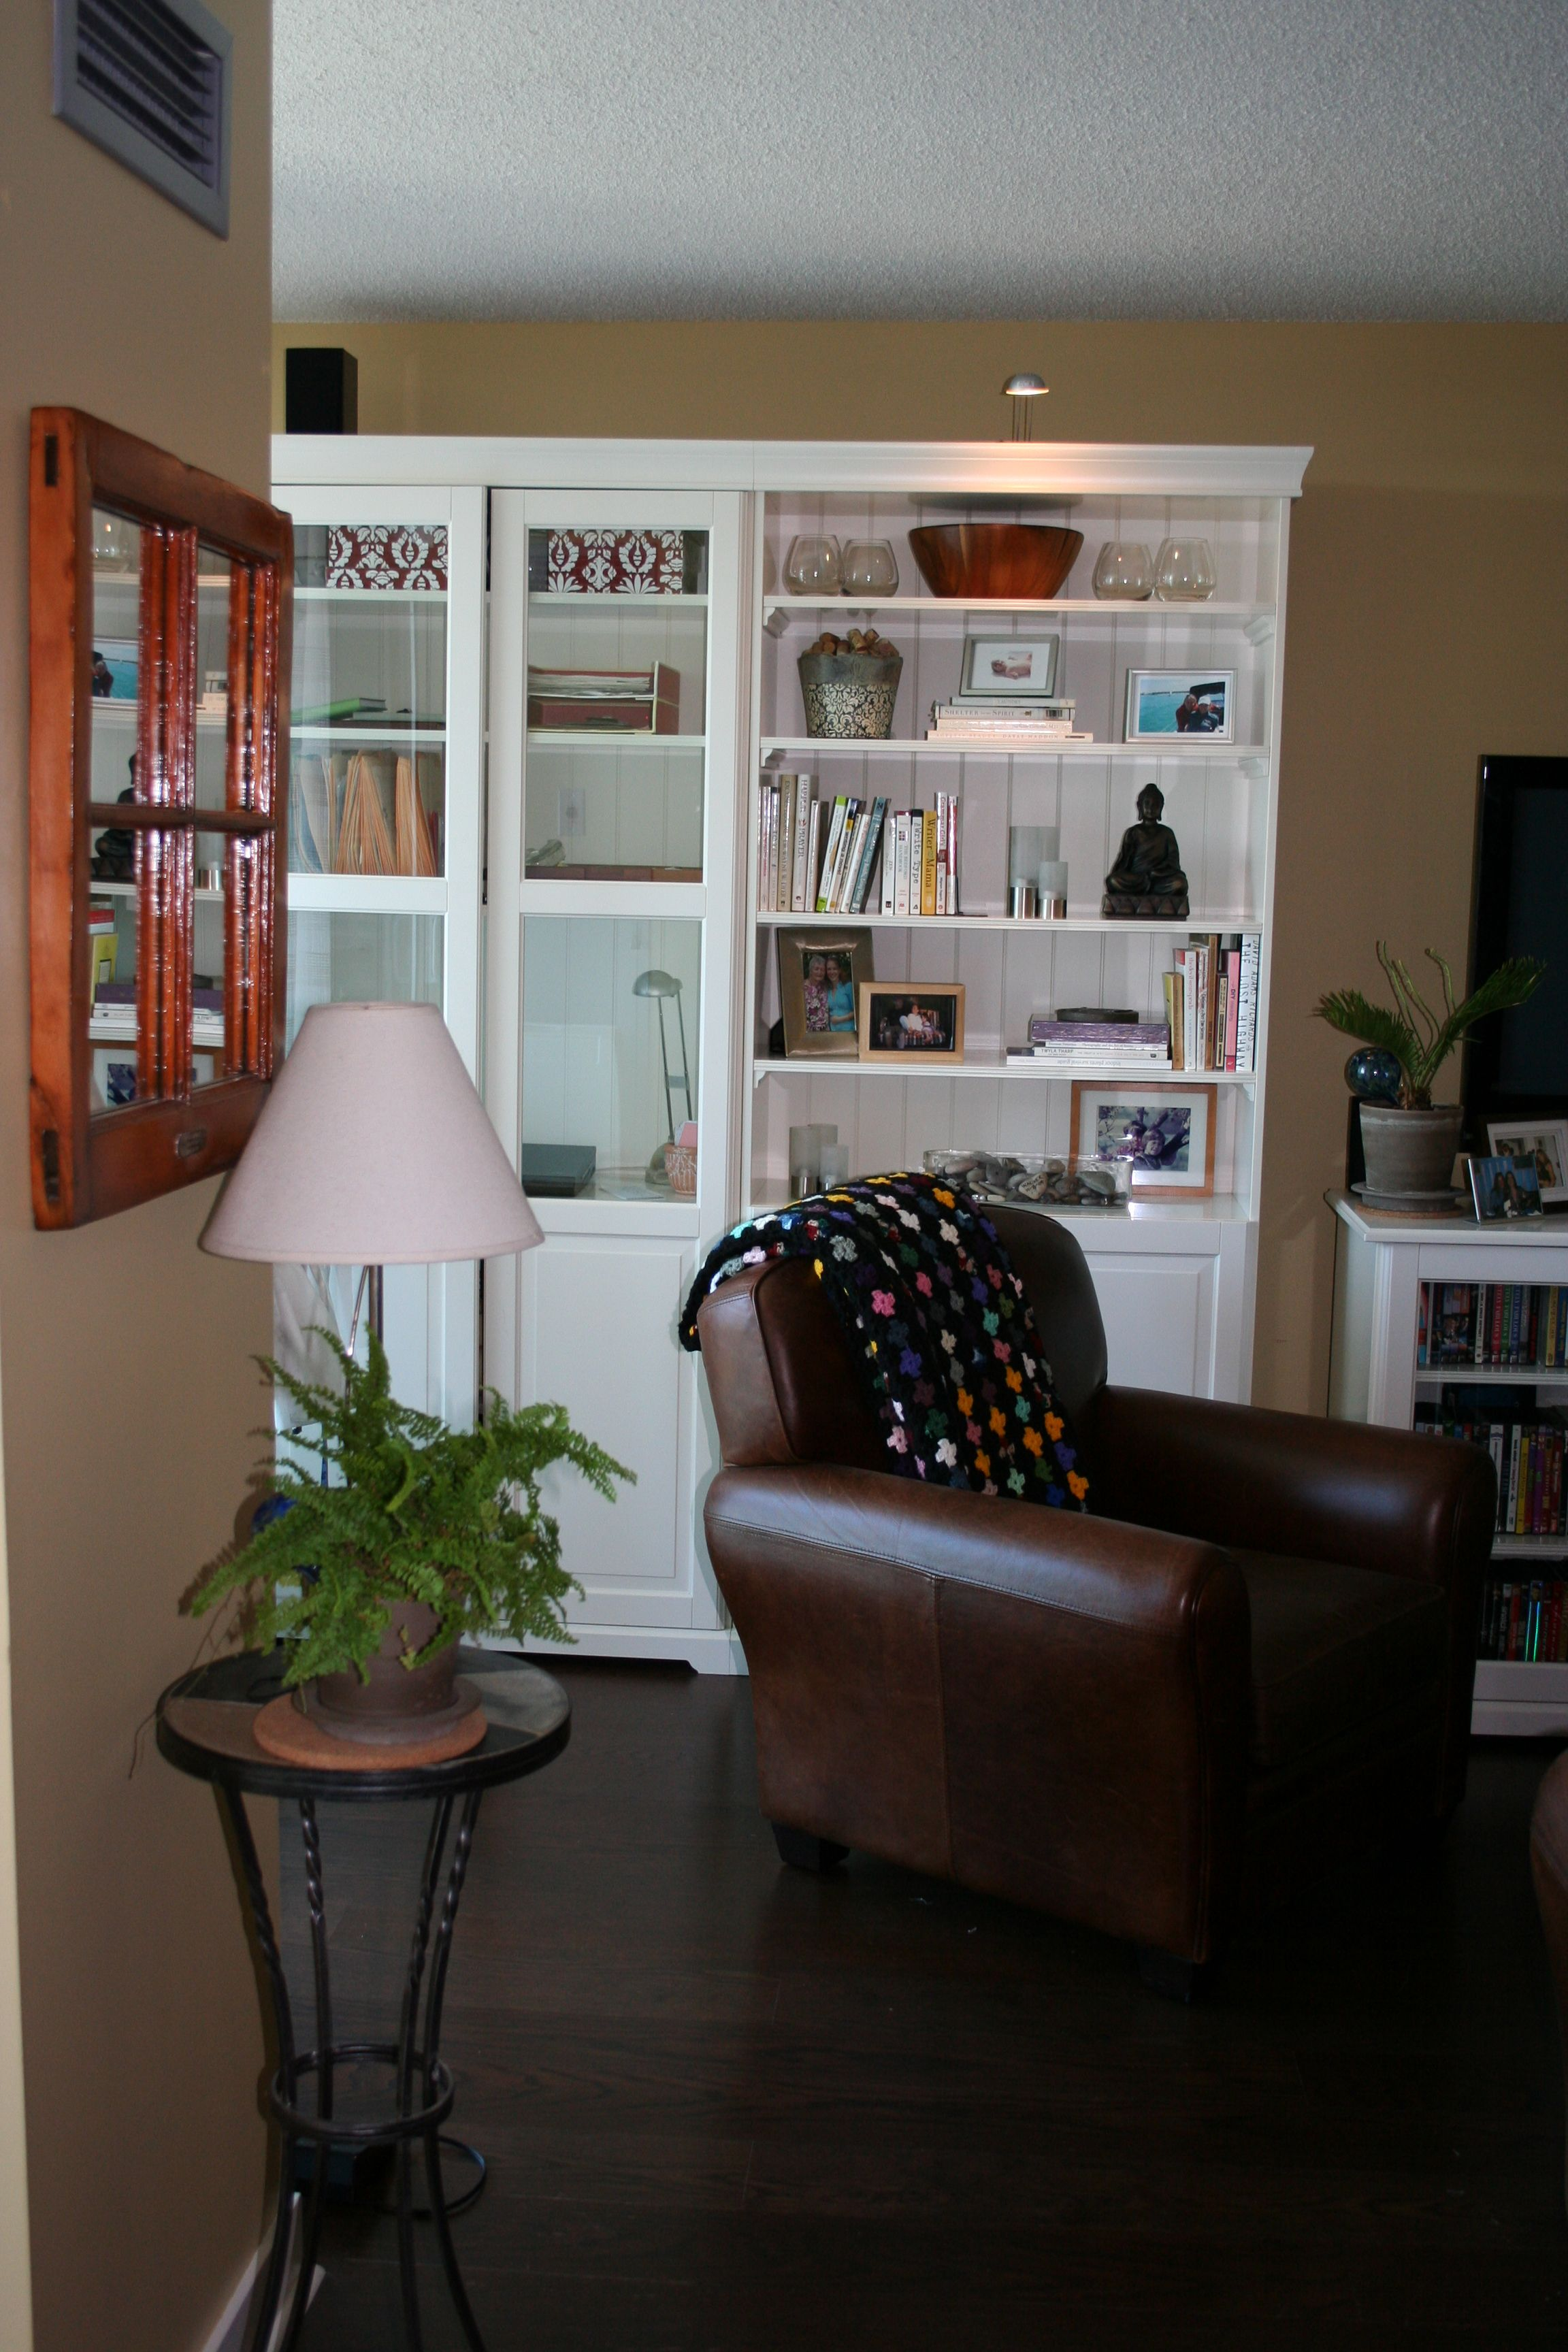 Ikea Liatorp Idea For Wall Unit Muebles Decoracion De Unas